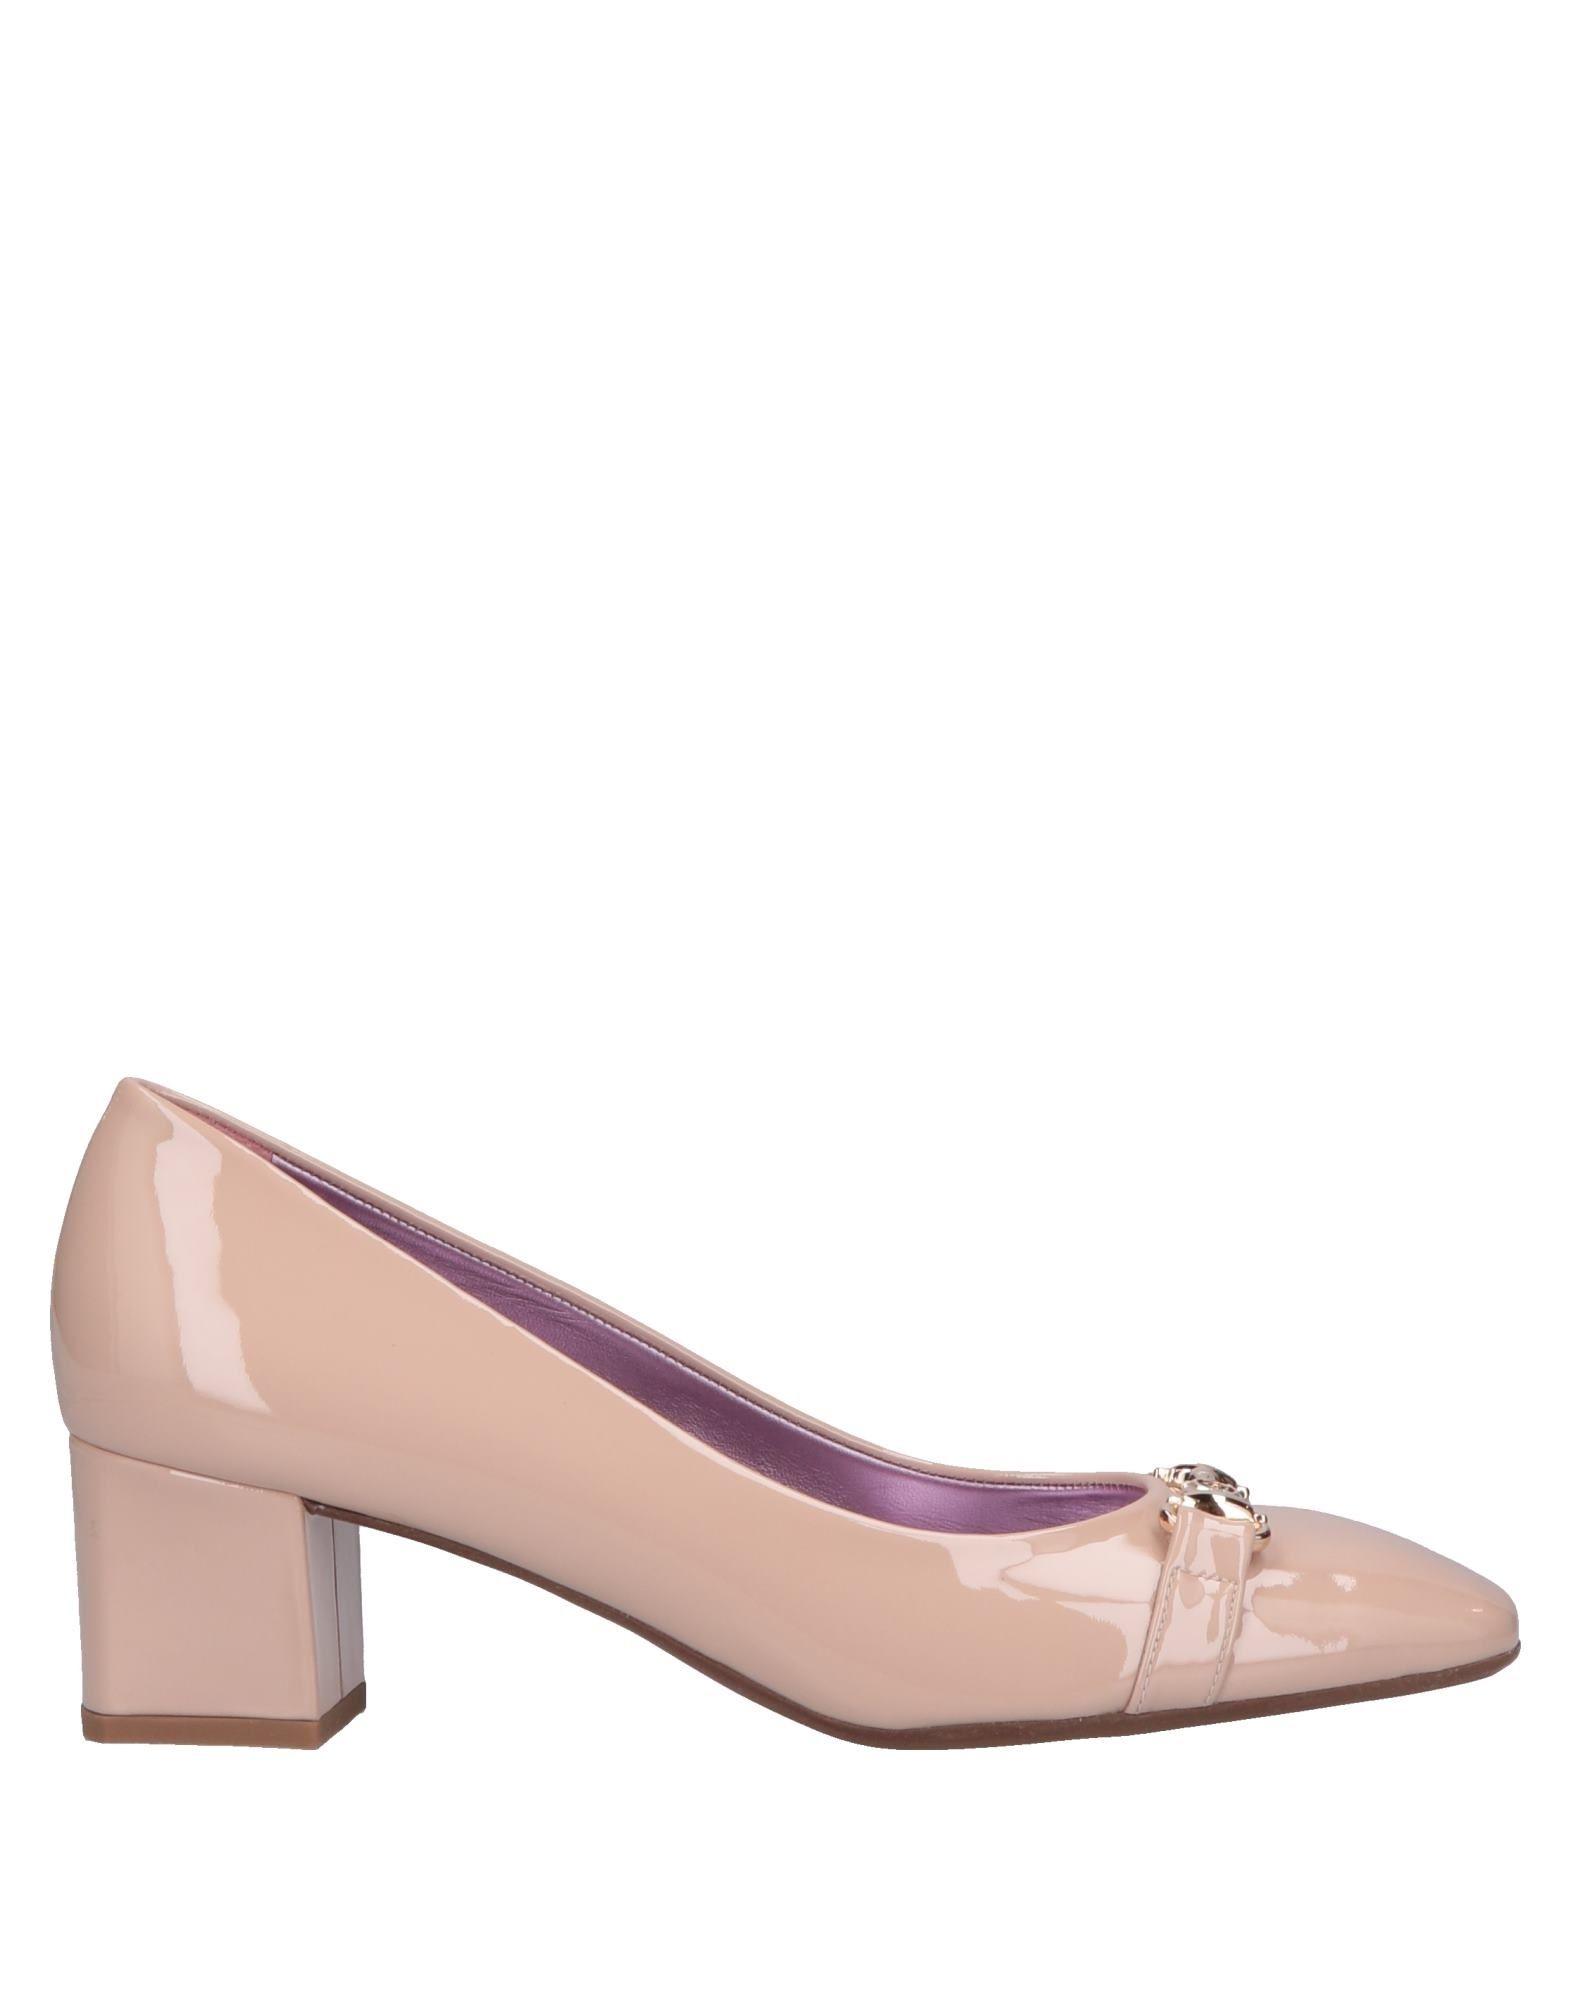 innovative design 63468 f855a Beige Zapato De Salón Ursula Mascaro  Mujer Mujer Mujer - Salones Ursula  Mascaro  Moda barata y hermosa 7c6108